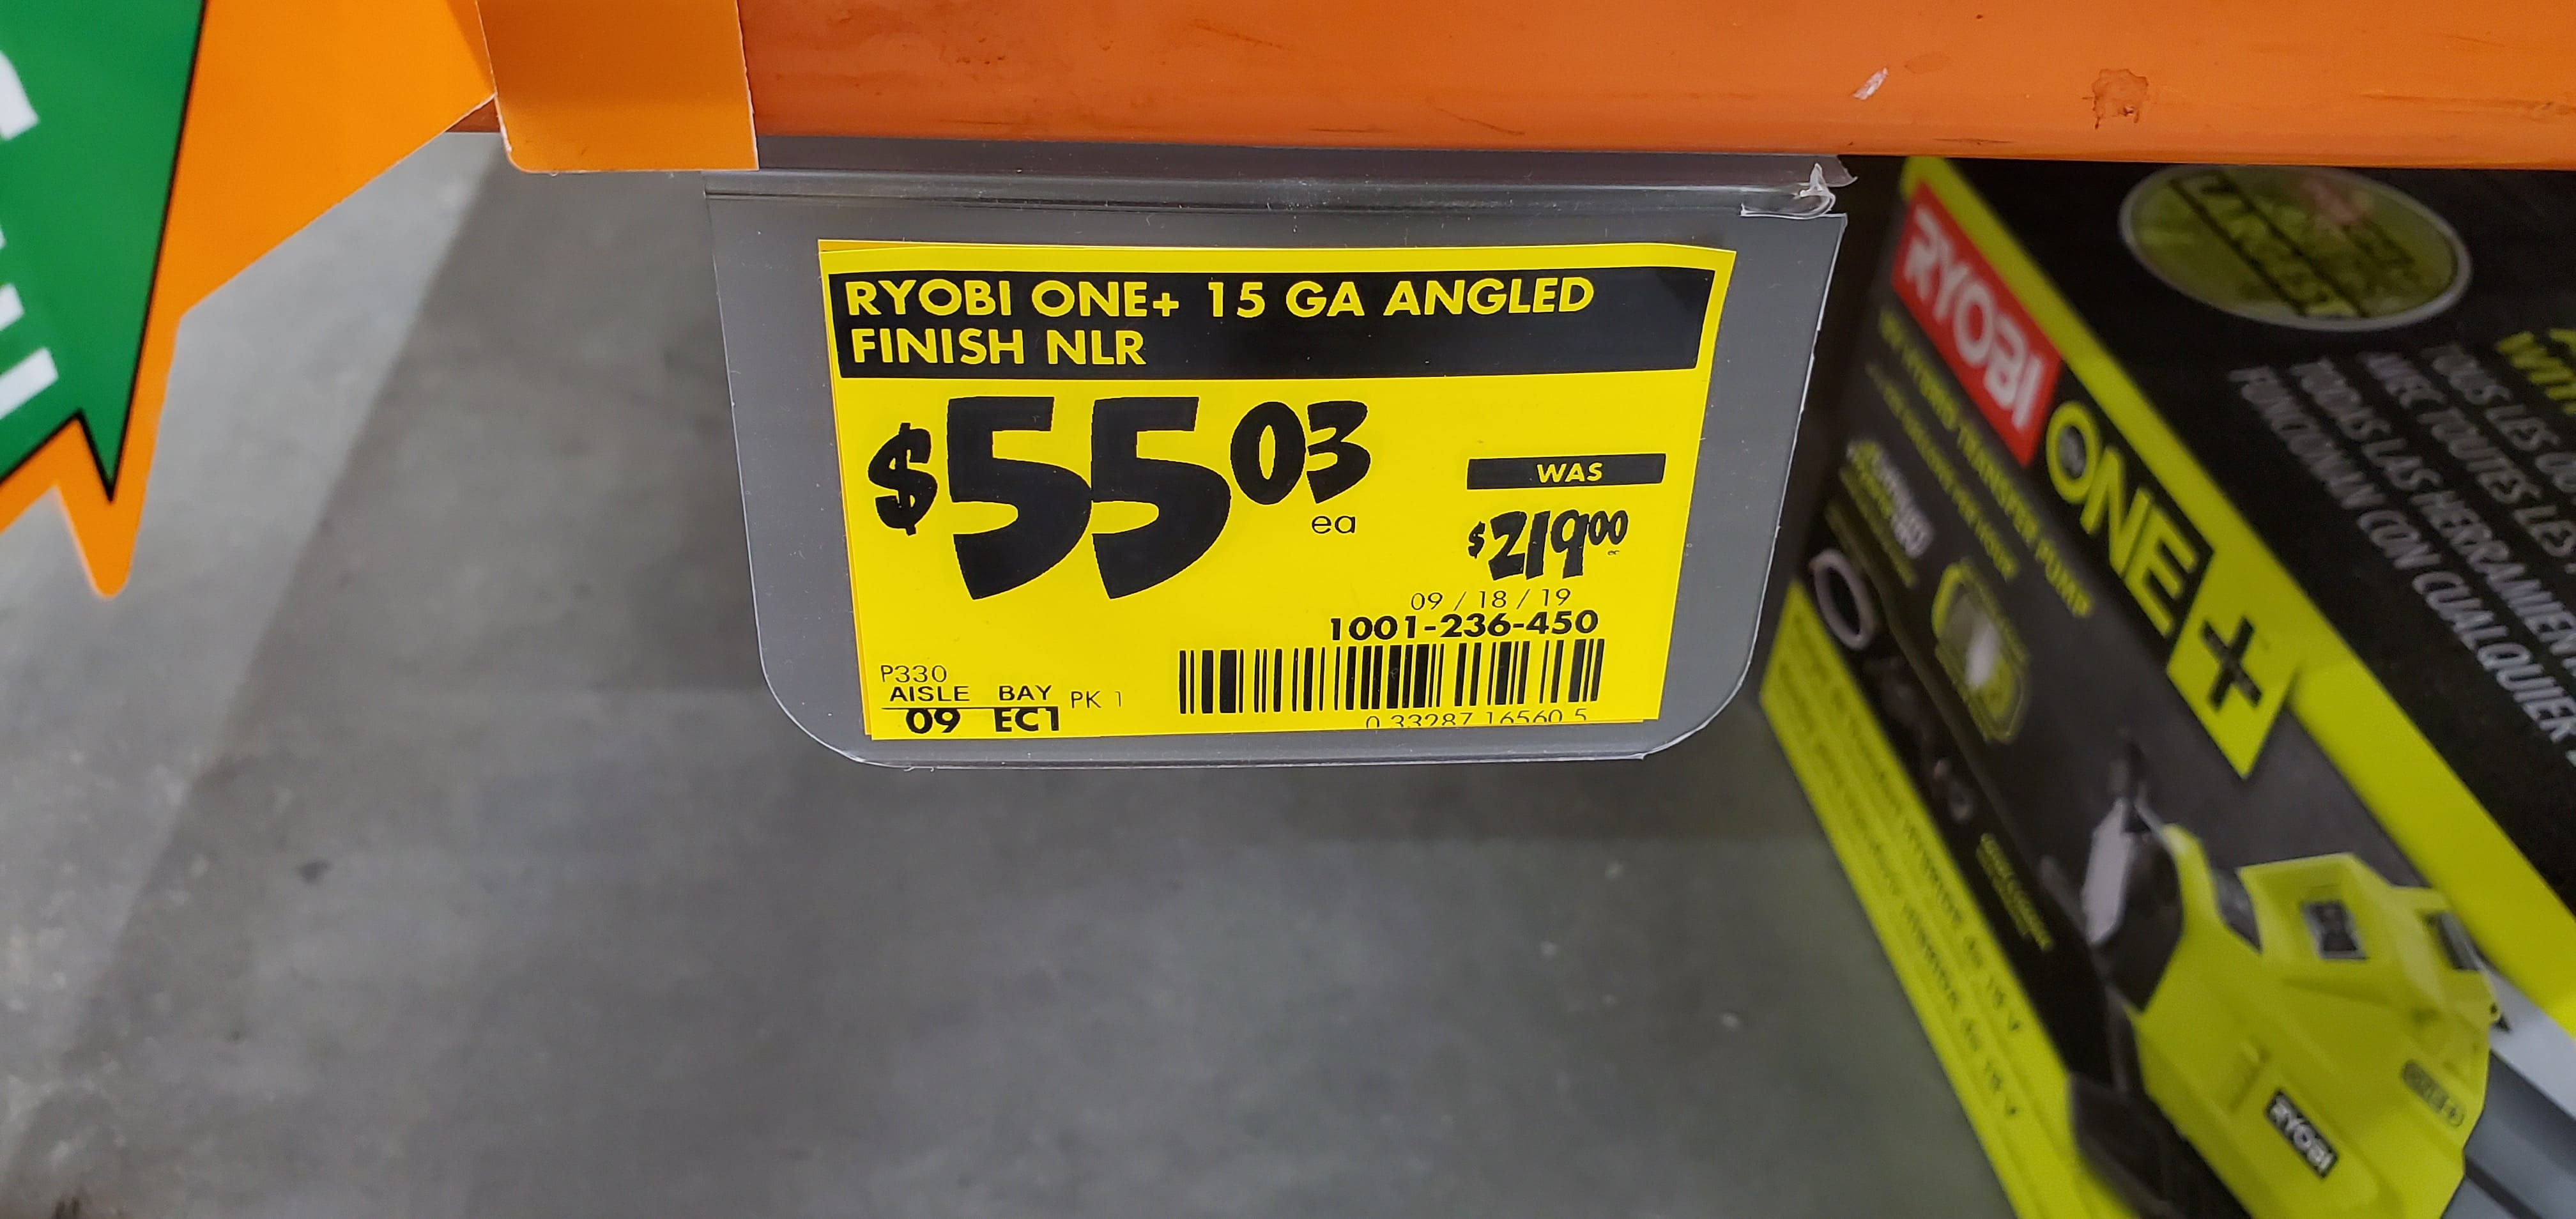 Ryobi 18v One+ Angled Finish Nailer 15 gauge P330 $55 New @ Home Depot YMMV B&M